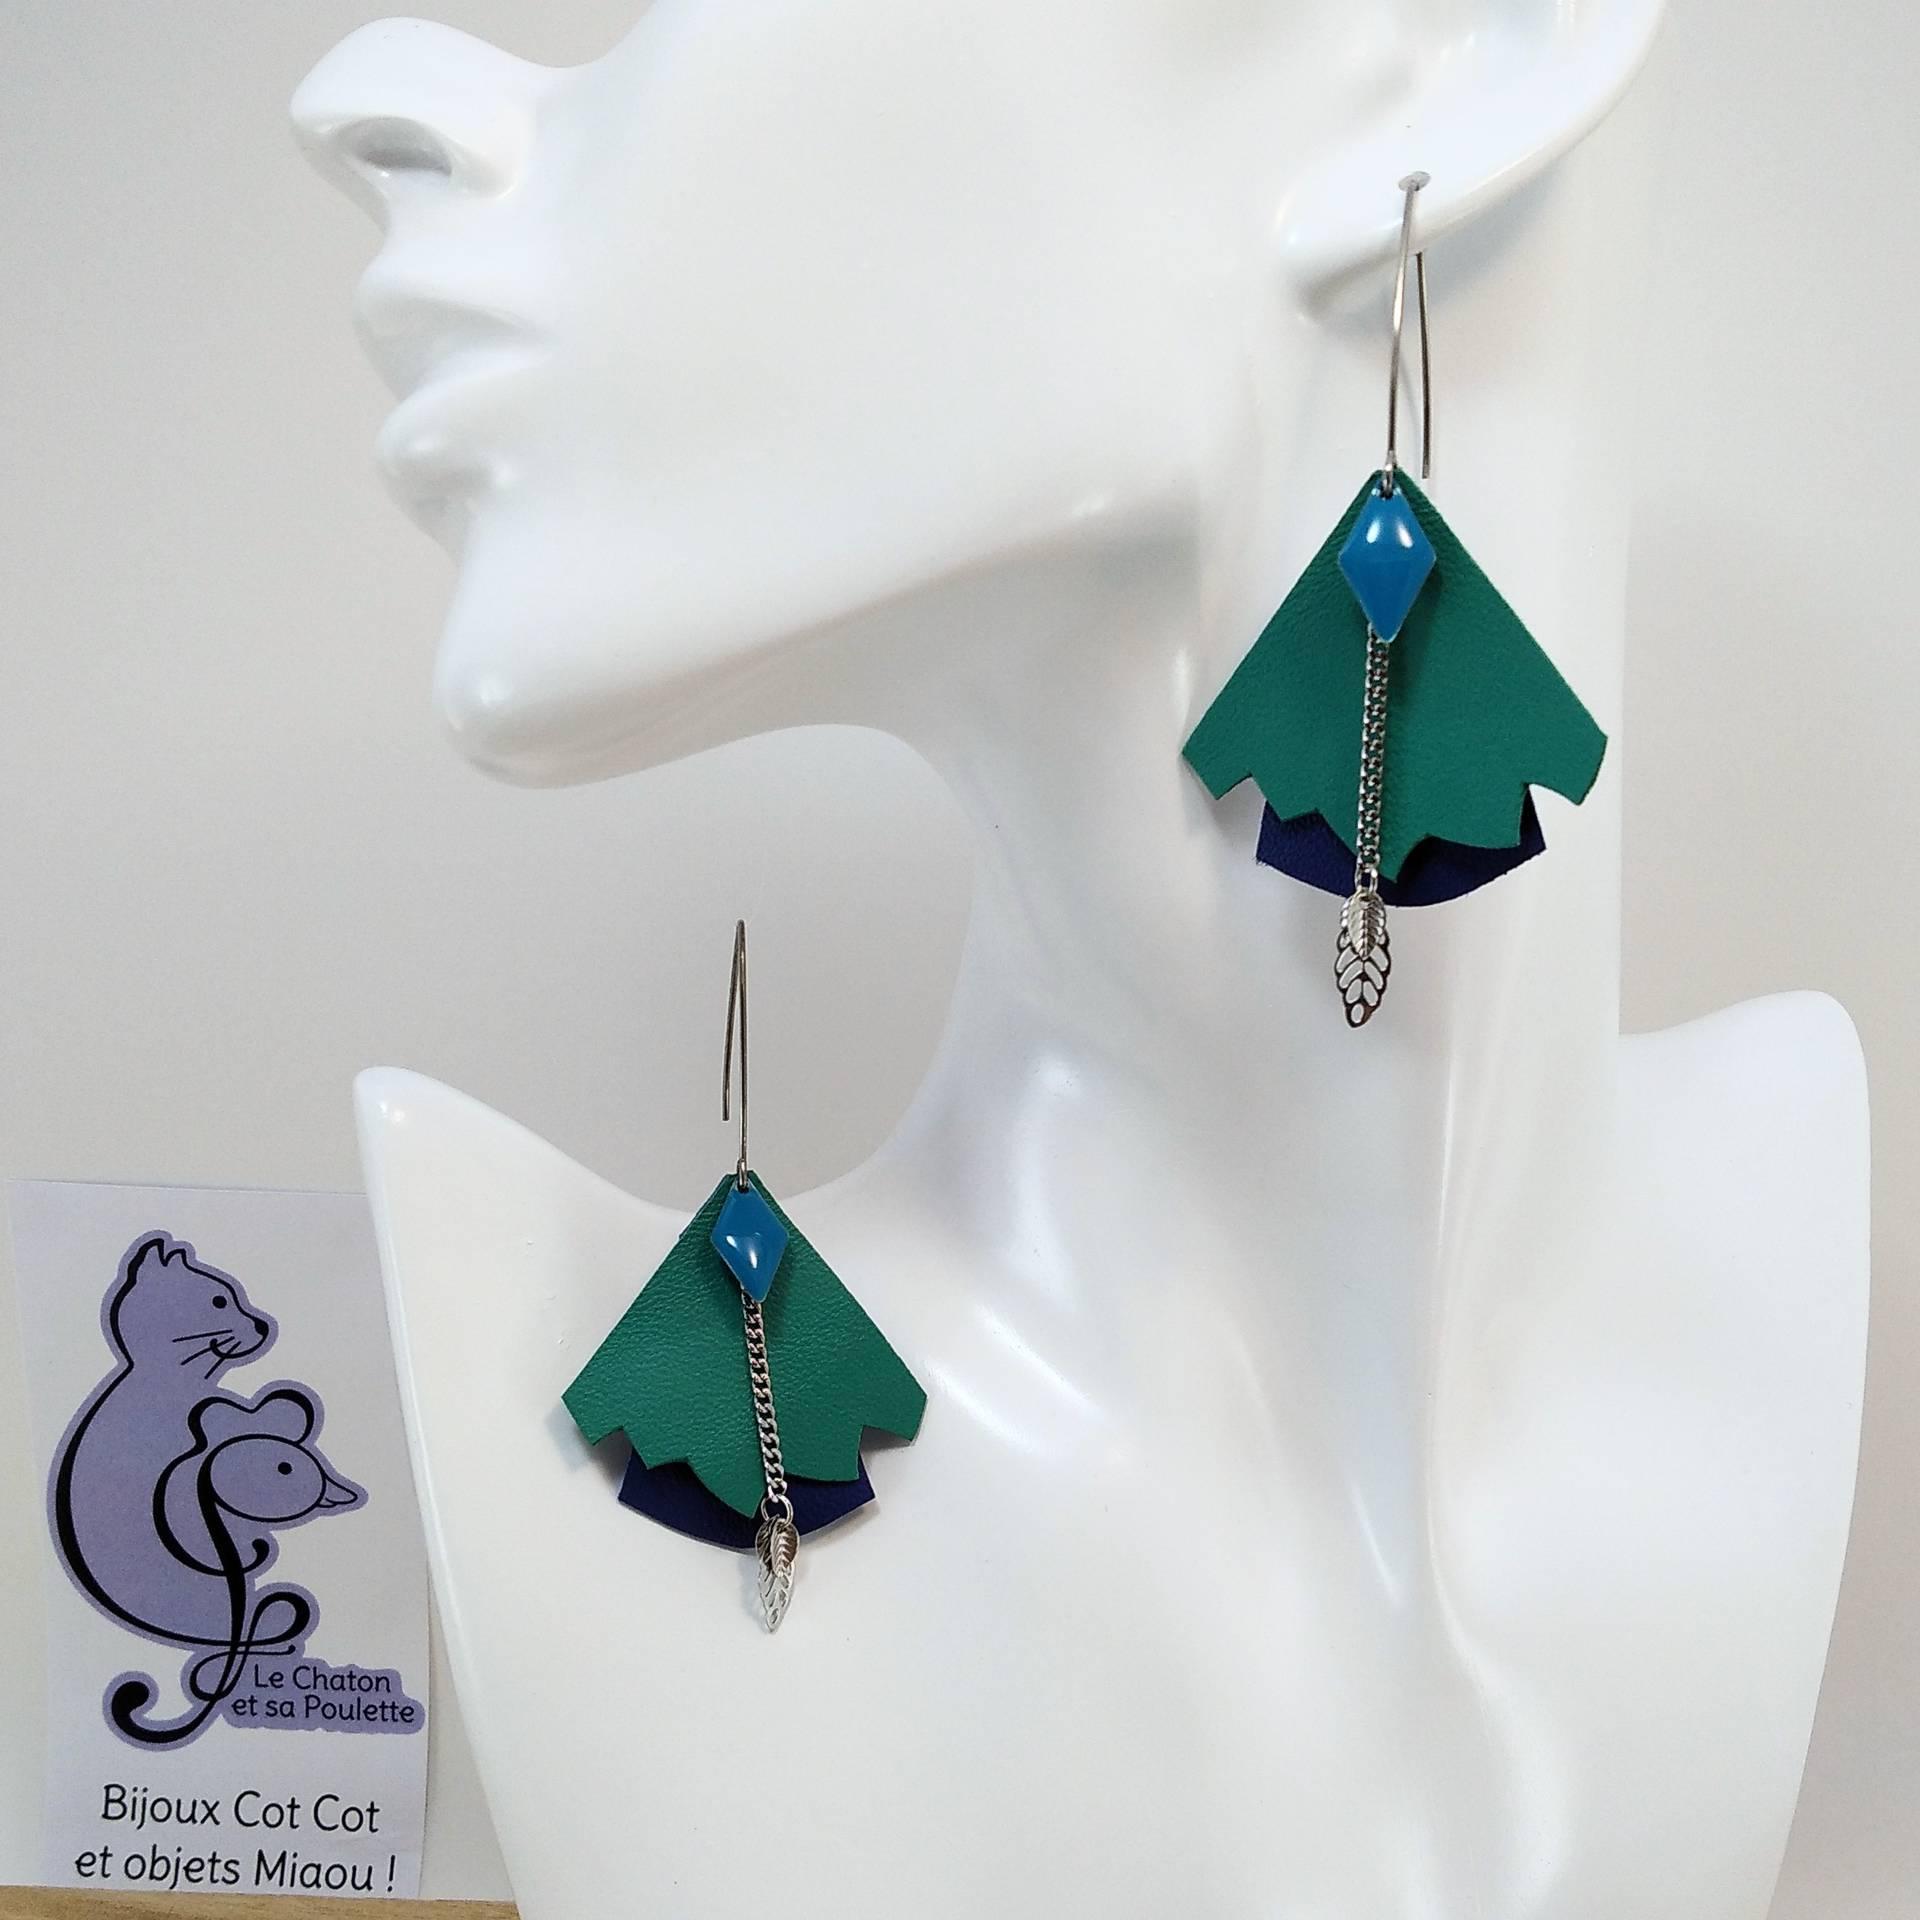 BO FORMIDABLE modèle n°5 Cuirs vert prasin et bleu marine, breloque diamant bleu cérulé